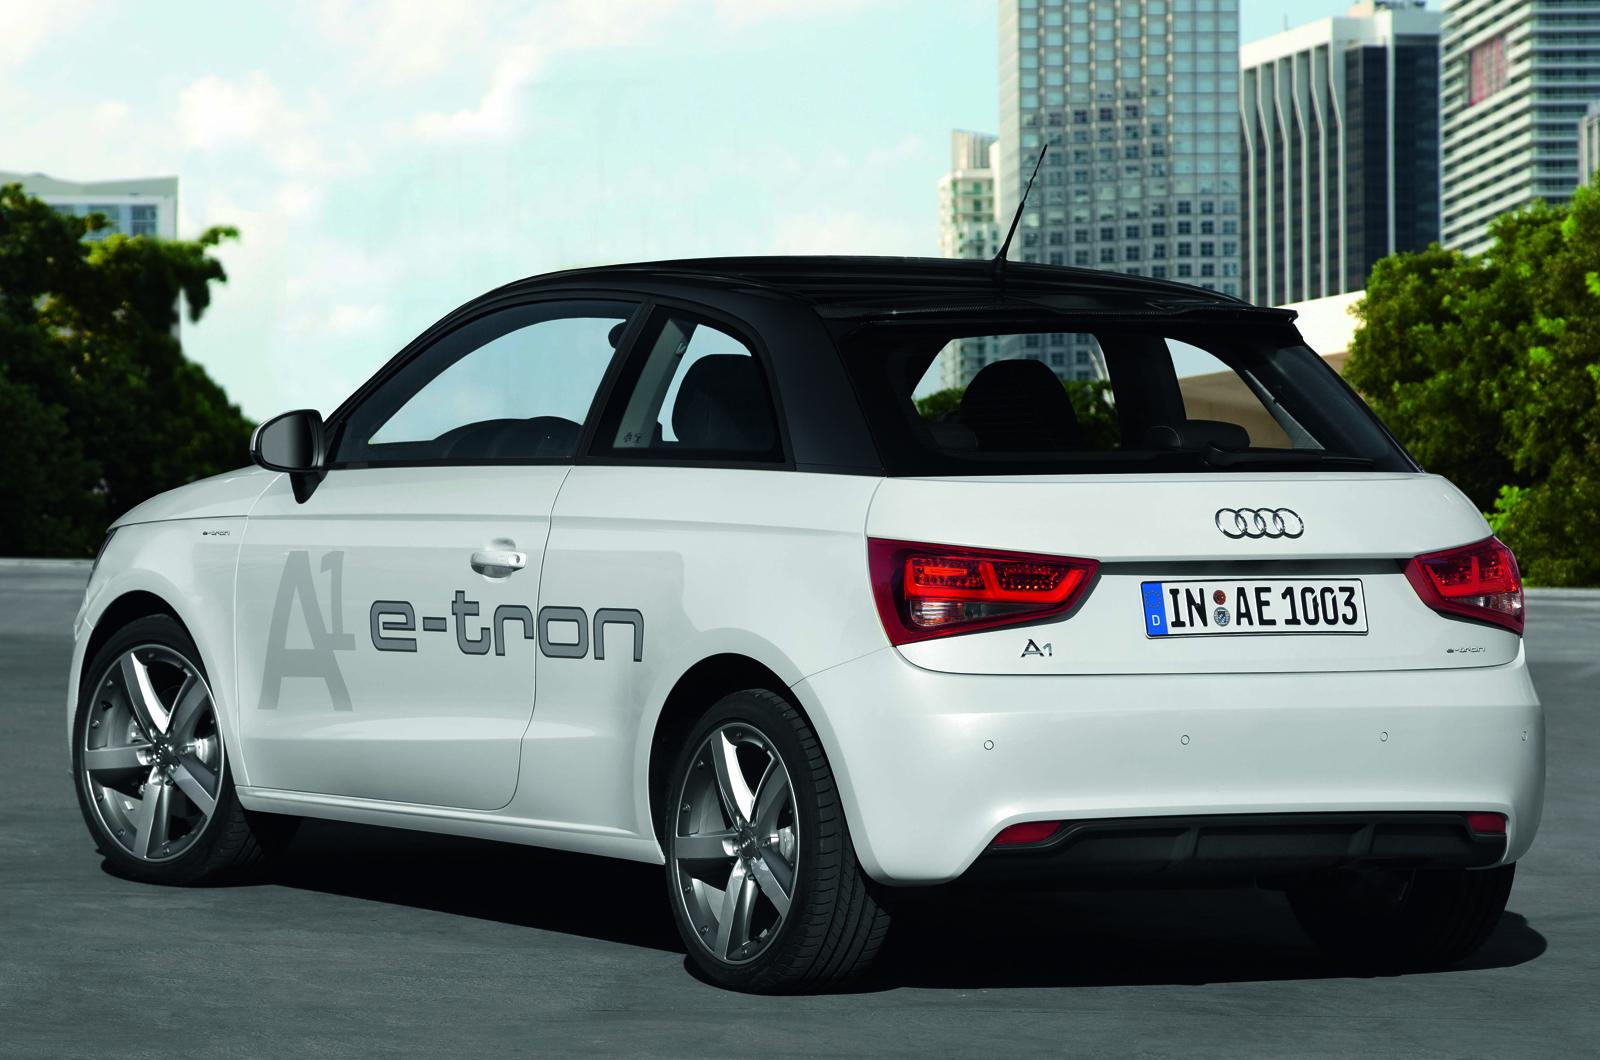 first drive review audi a1 e tron dual mode hybrid review autocar. Black Bedroom Furniture Sets. Home Design Ideas